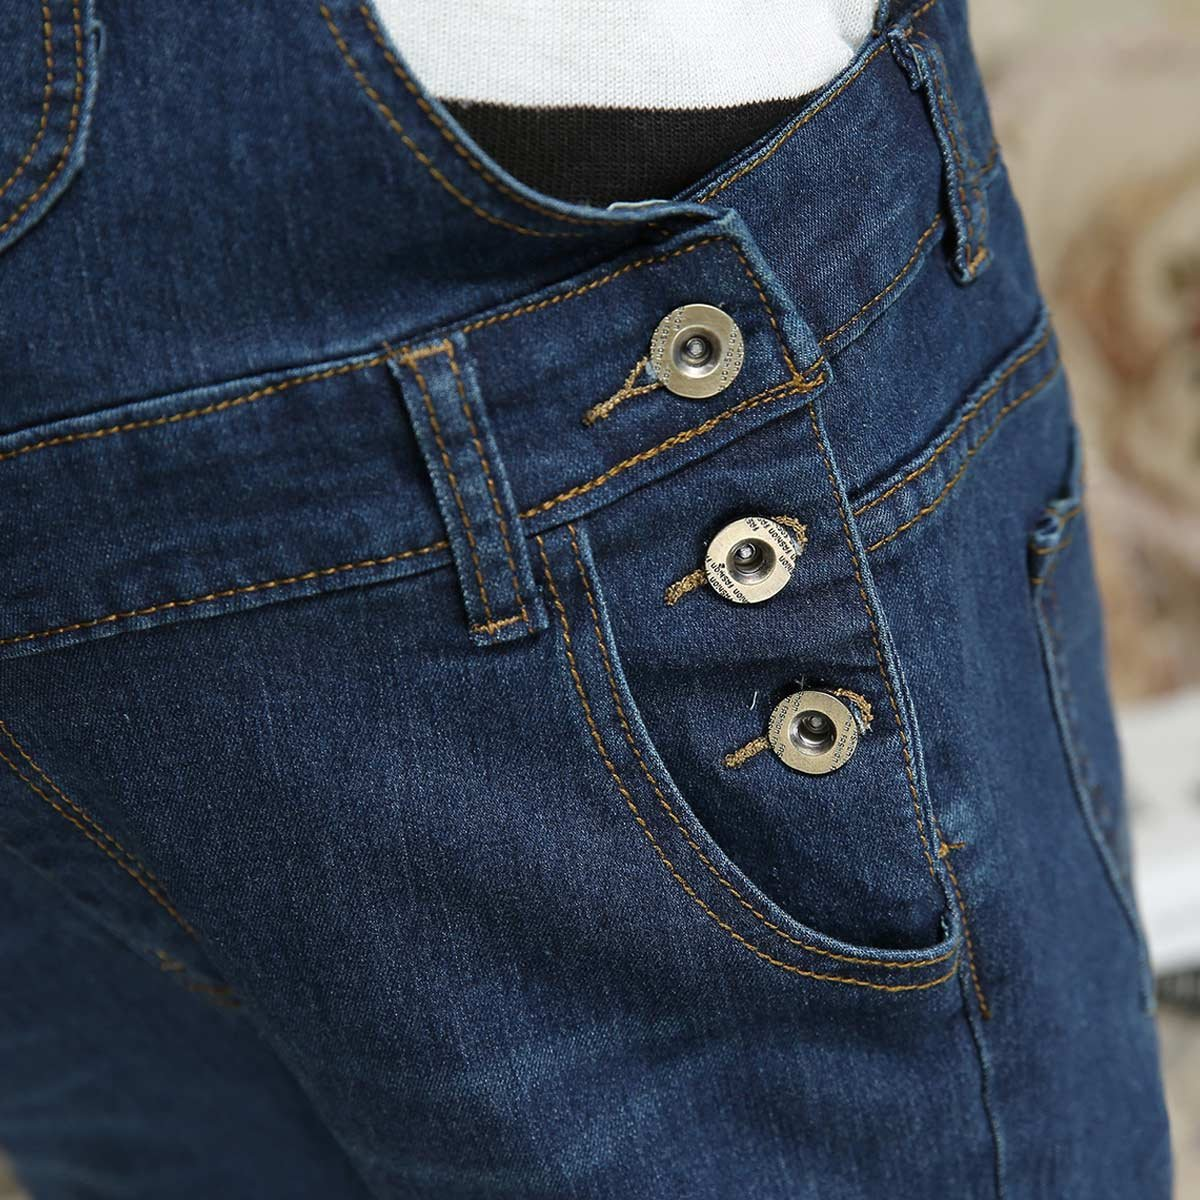 cc7f9b1a2f1d Amazon.com  Aivtalk Women Maternity Spring Soft Denim Overalls Adjustable  Jumpsuit Fit Belly Pants  Clothing